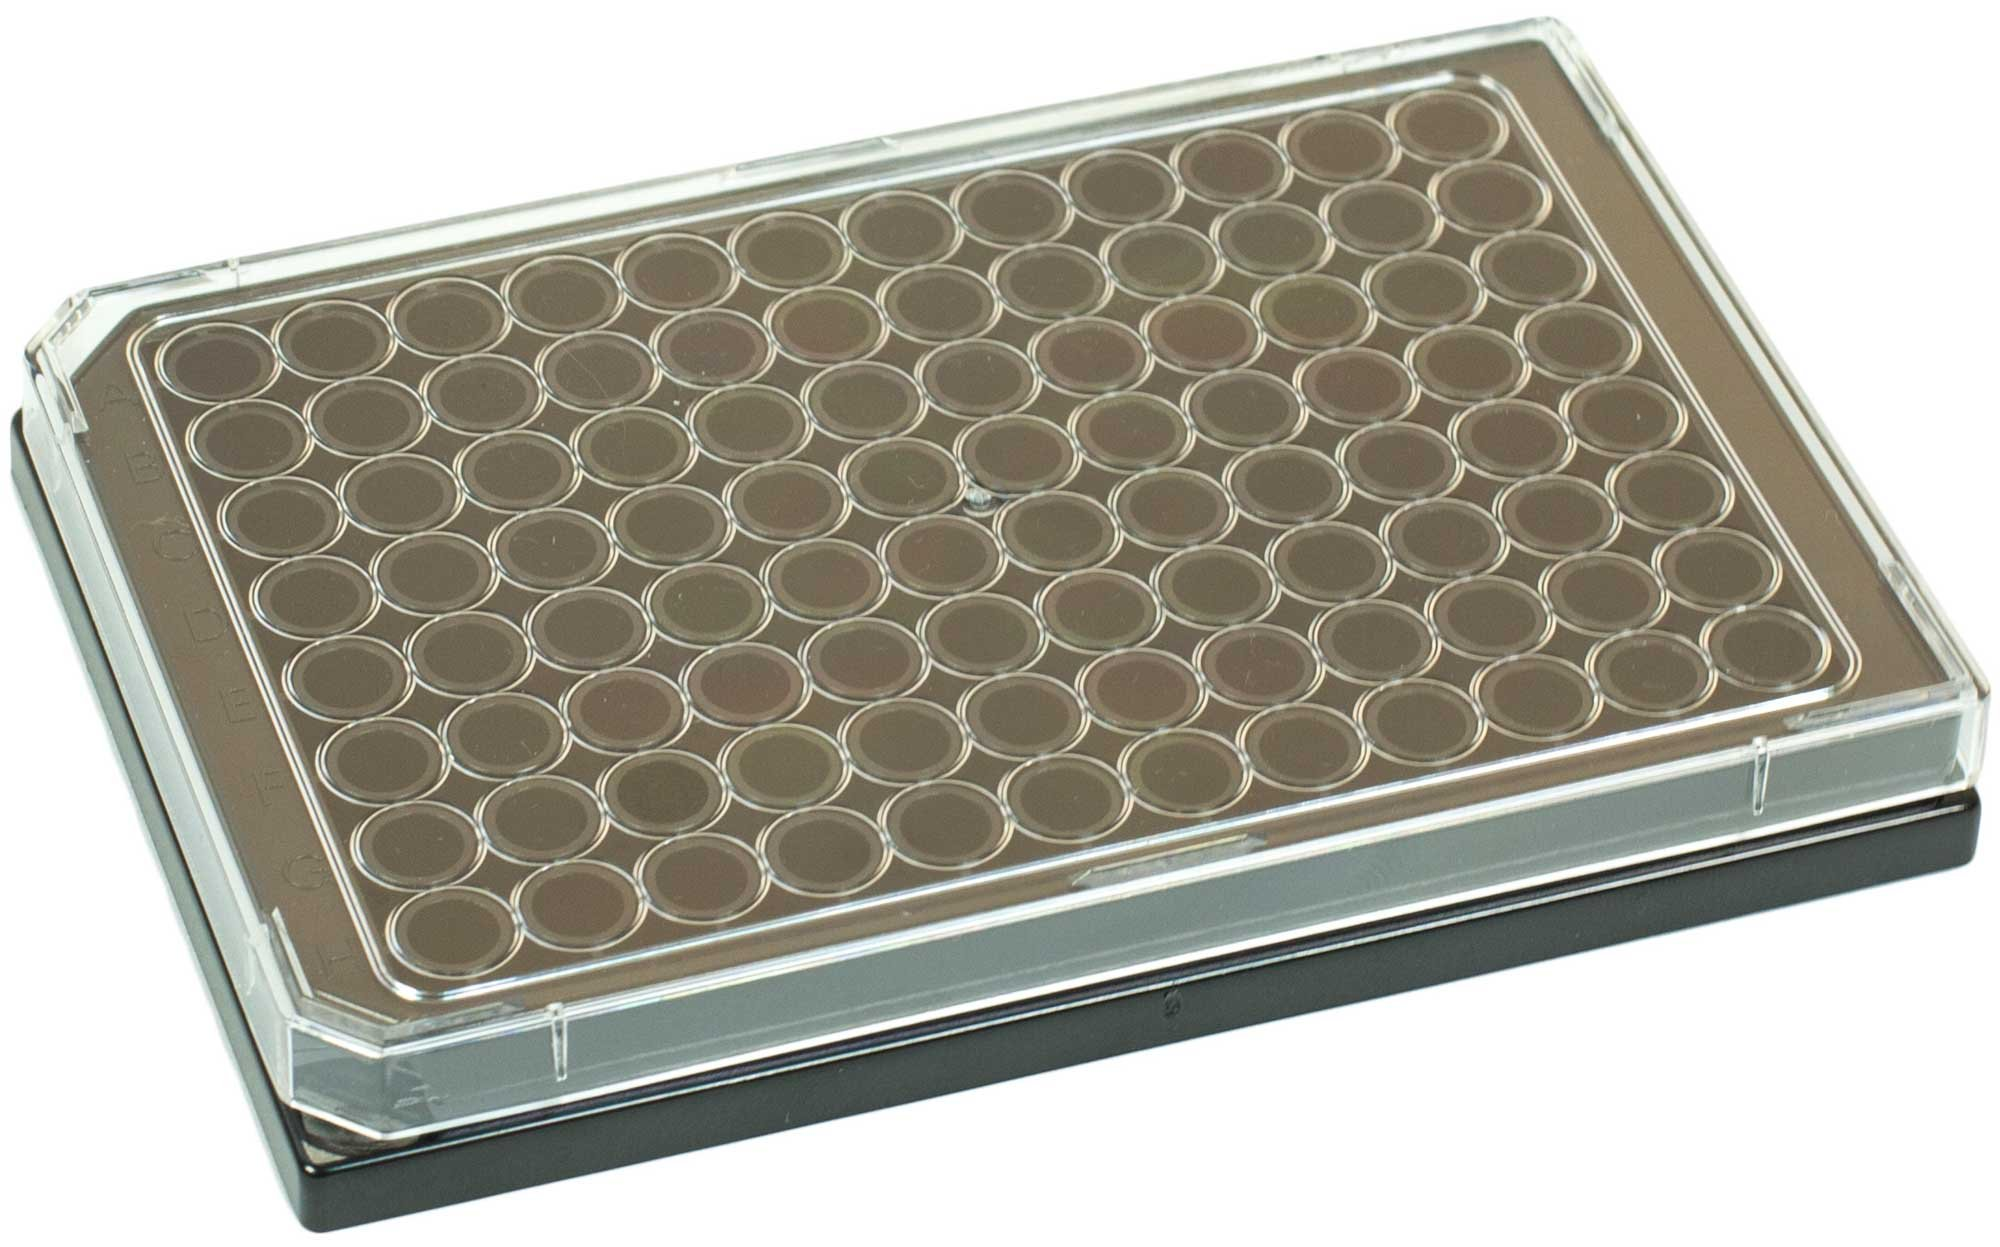 BRANDplates cellGrade Treated Sterile Surface 96-Well Plate - Black, Transparent F-Bottom